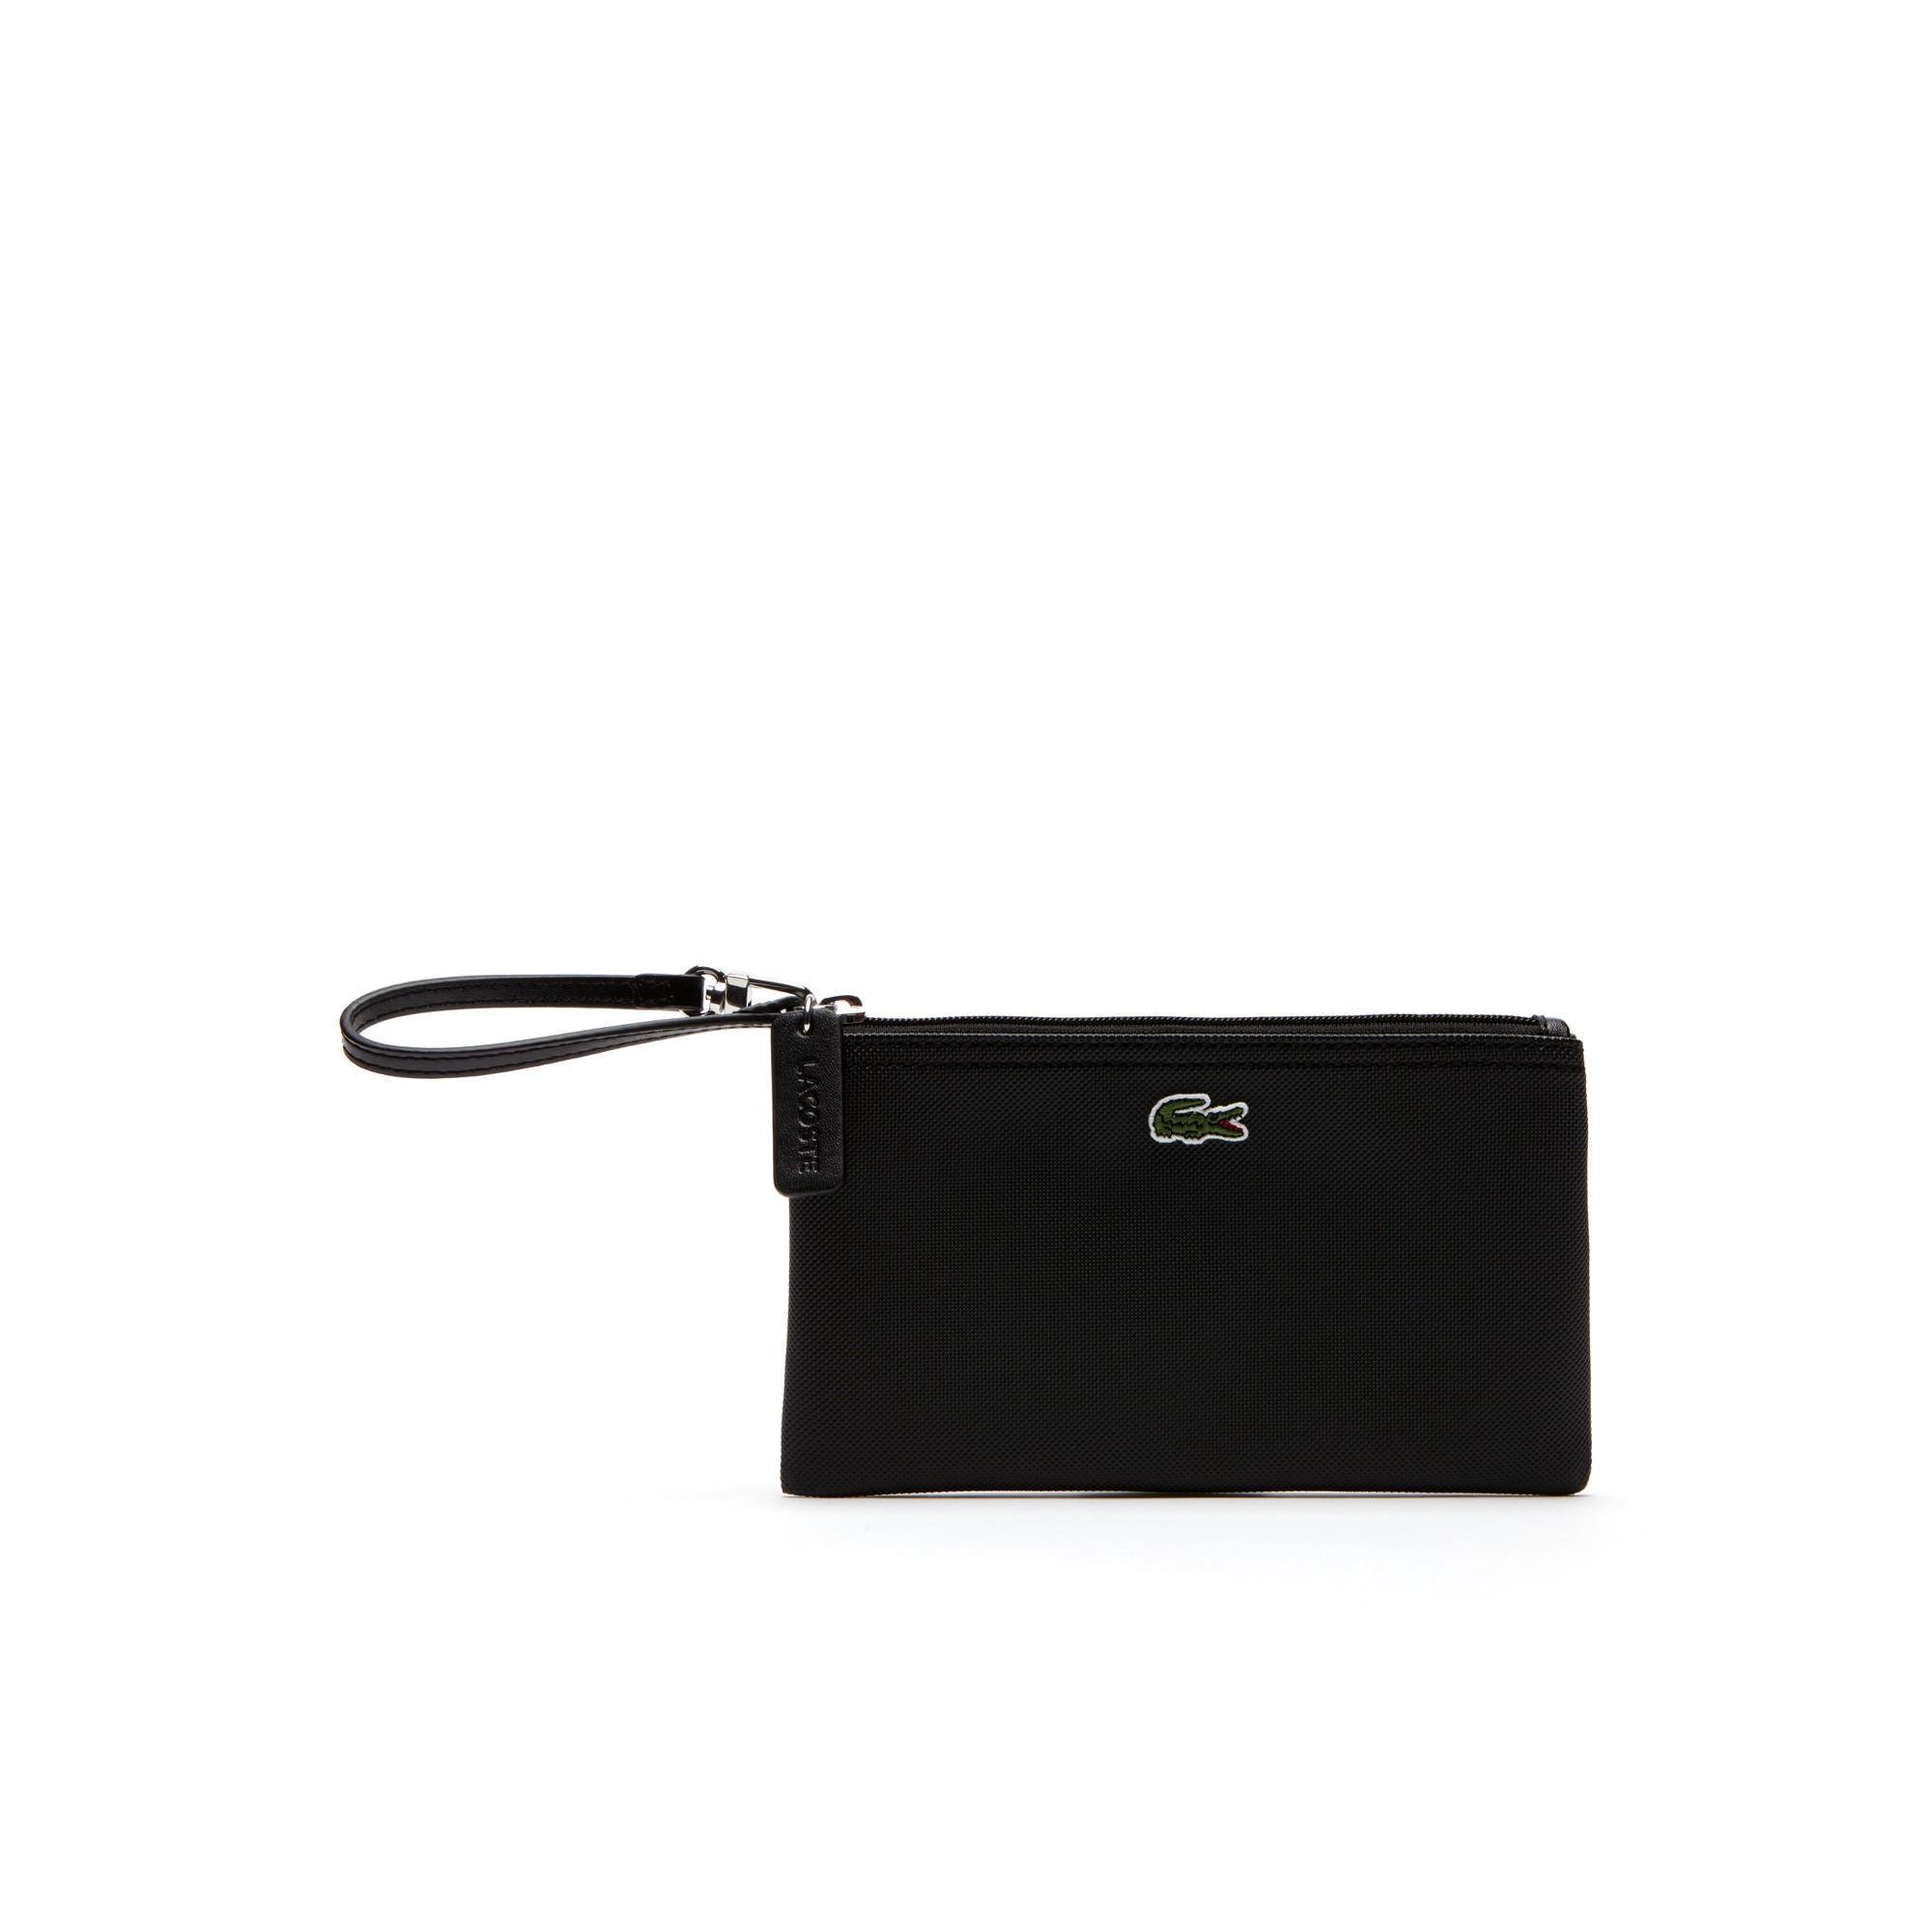 Lacoste Women's L.12.12 Concept Zip Clutch Bag In Black